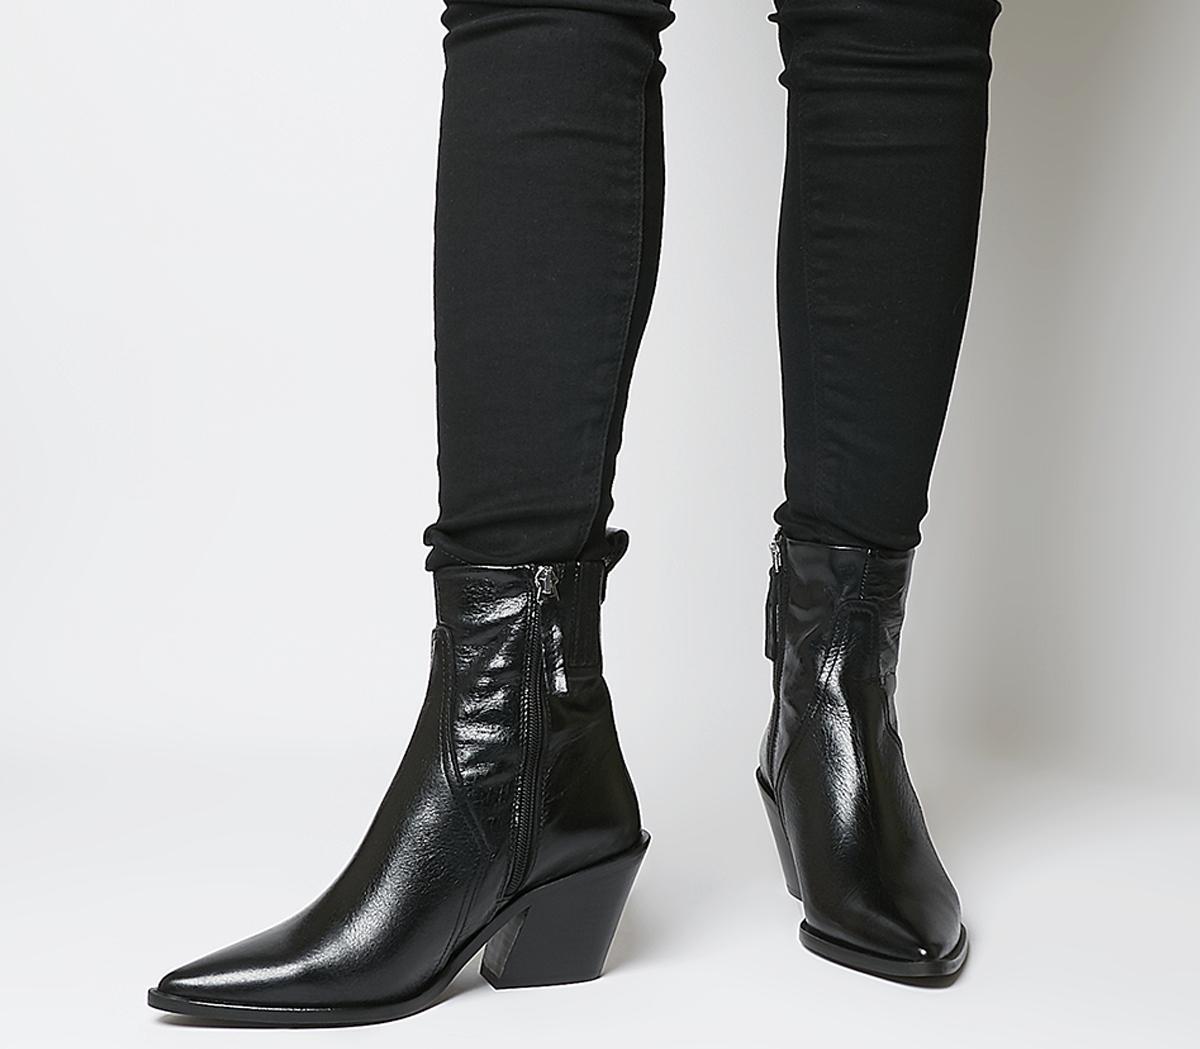 Office Americano Western Boots Black